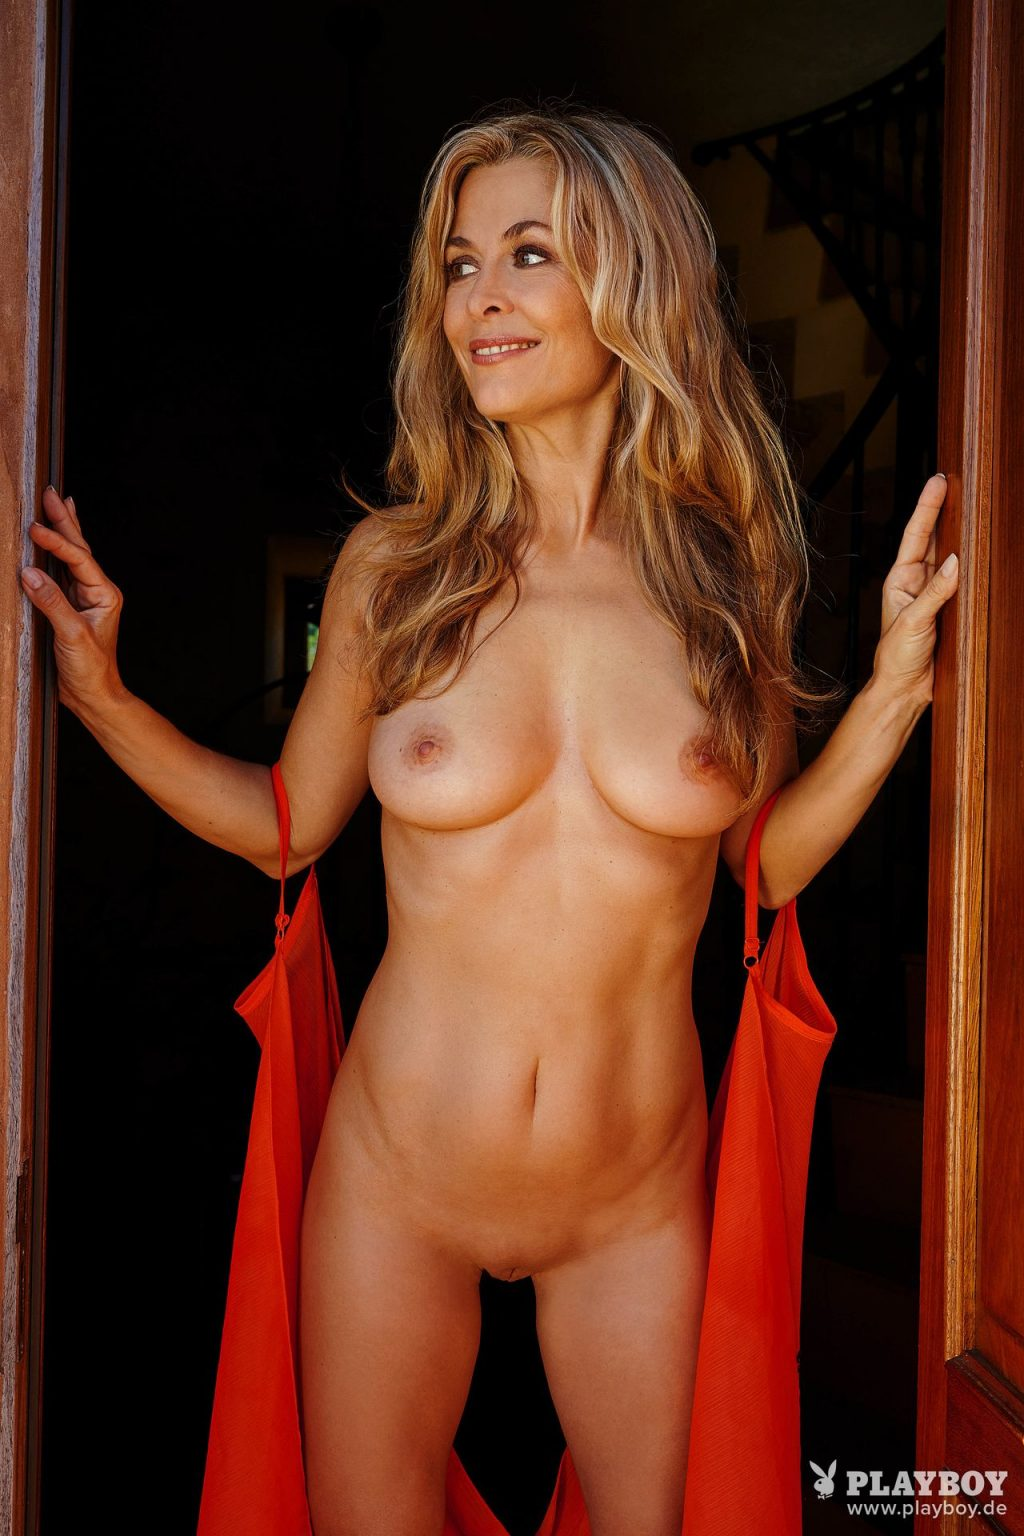 Marder  nackt Rebecca Rebecca marder